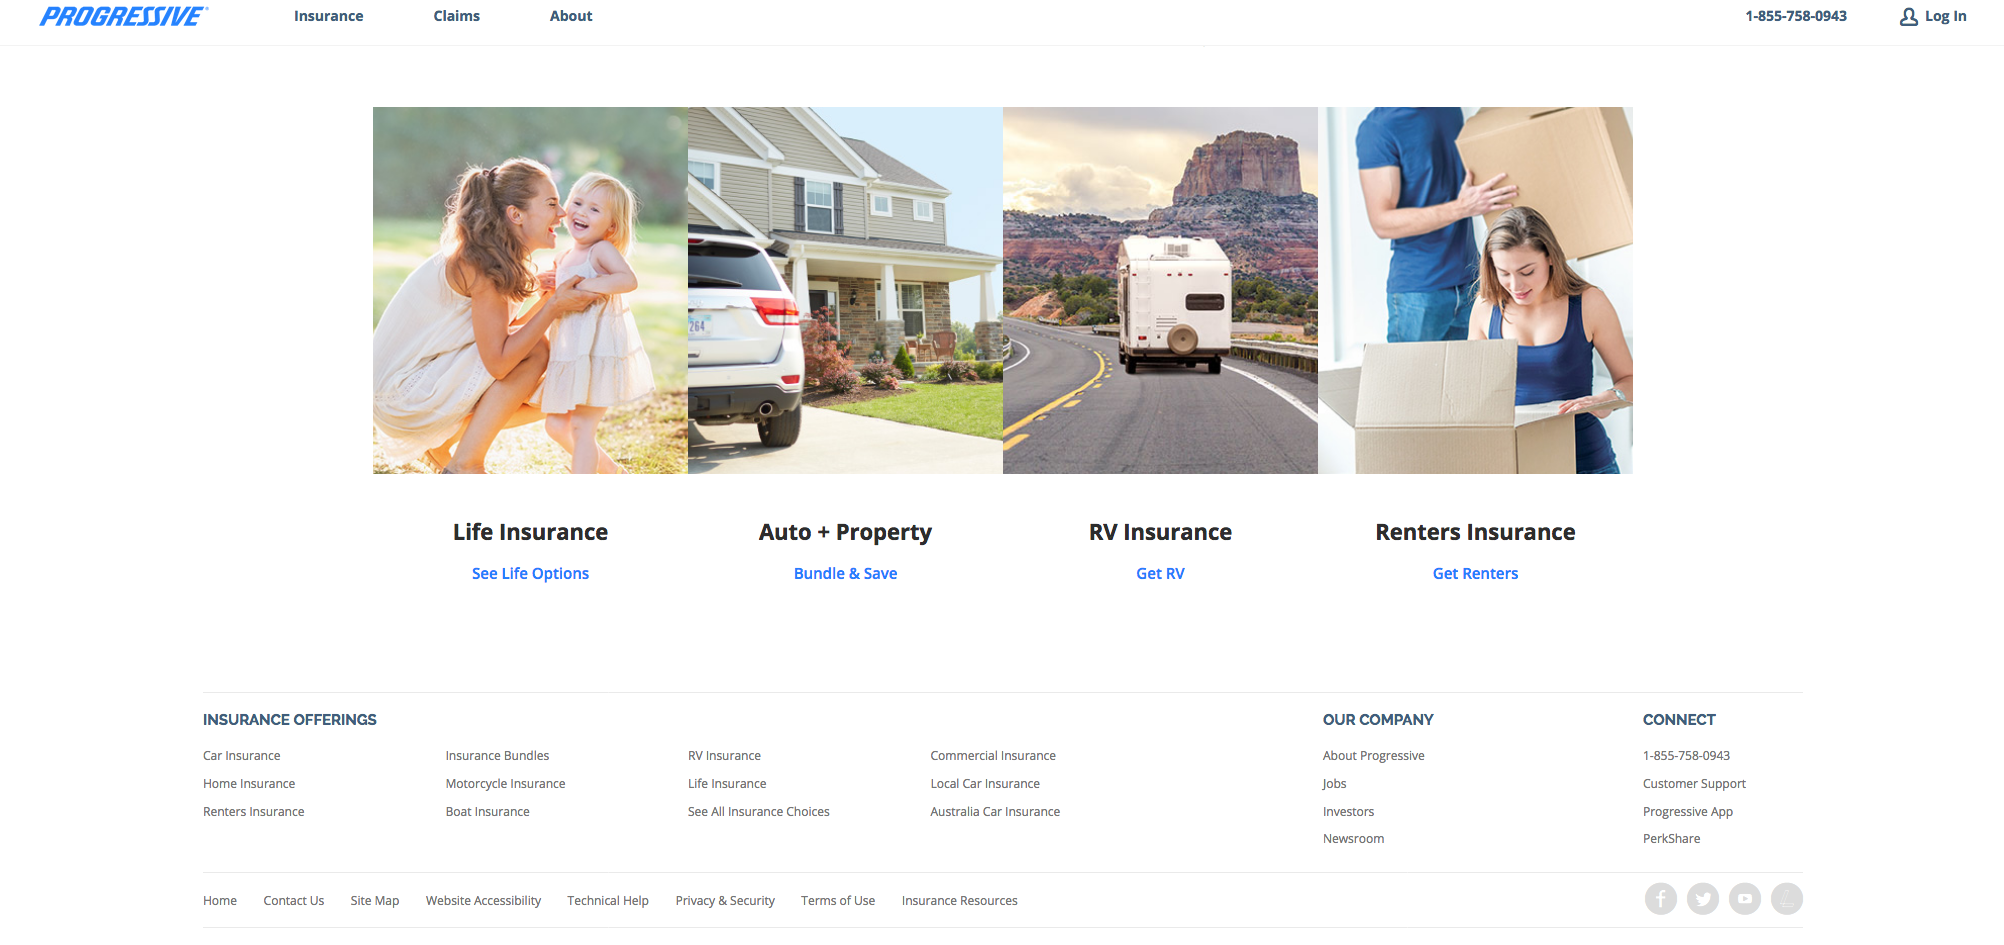 Footer. Progressive | Renters insurance, Renter, Polaroid film